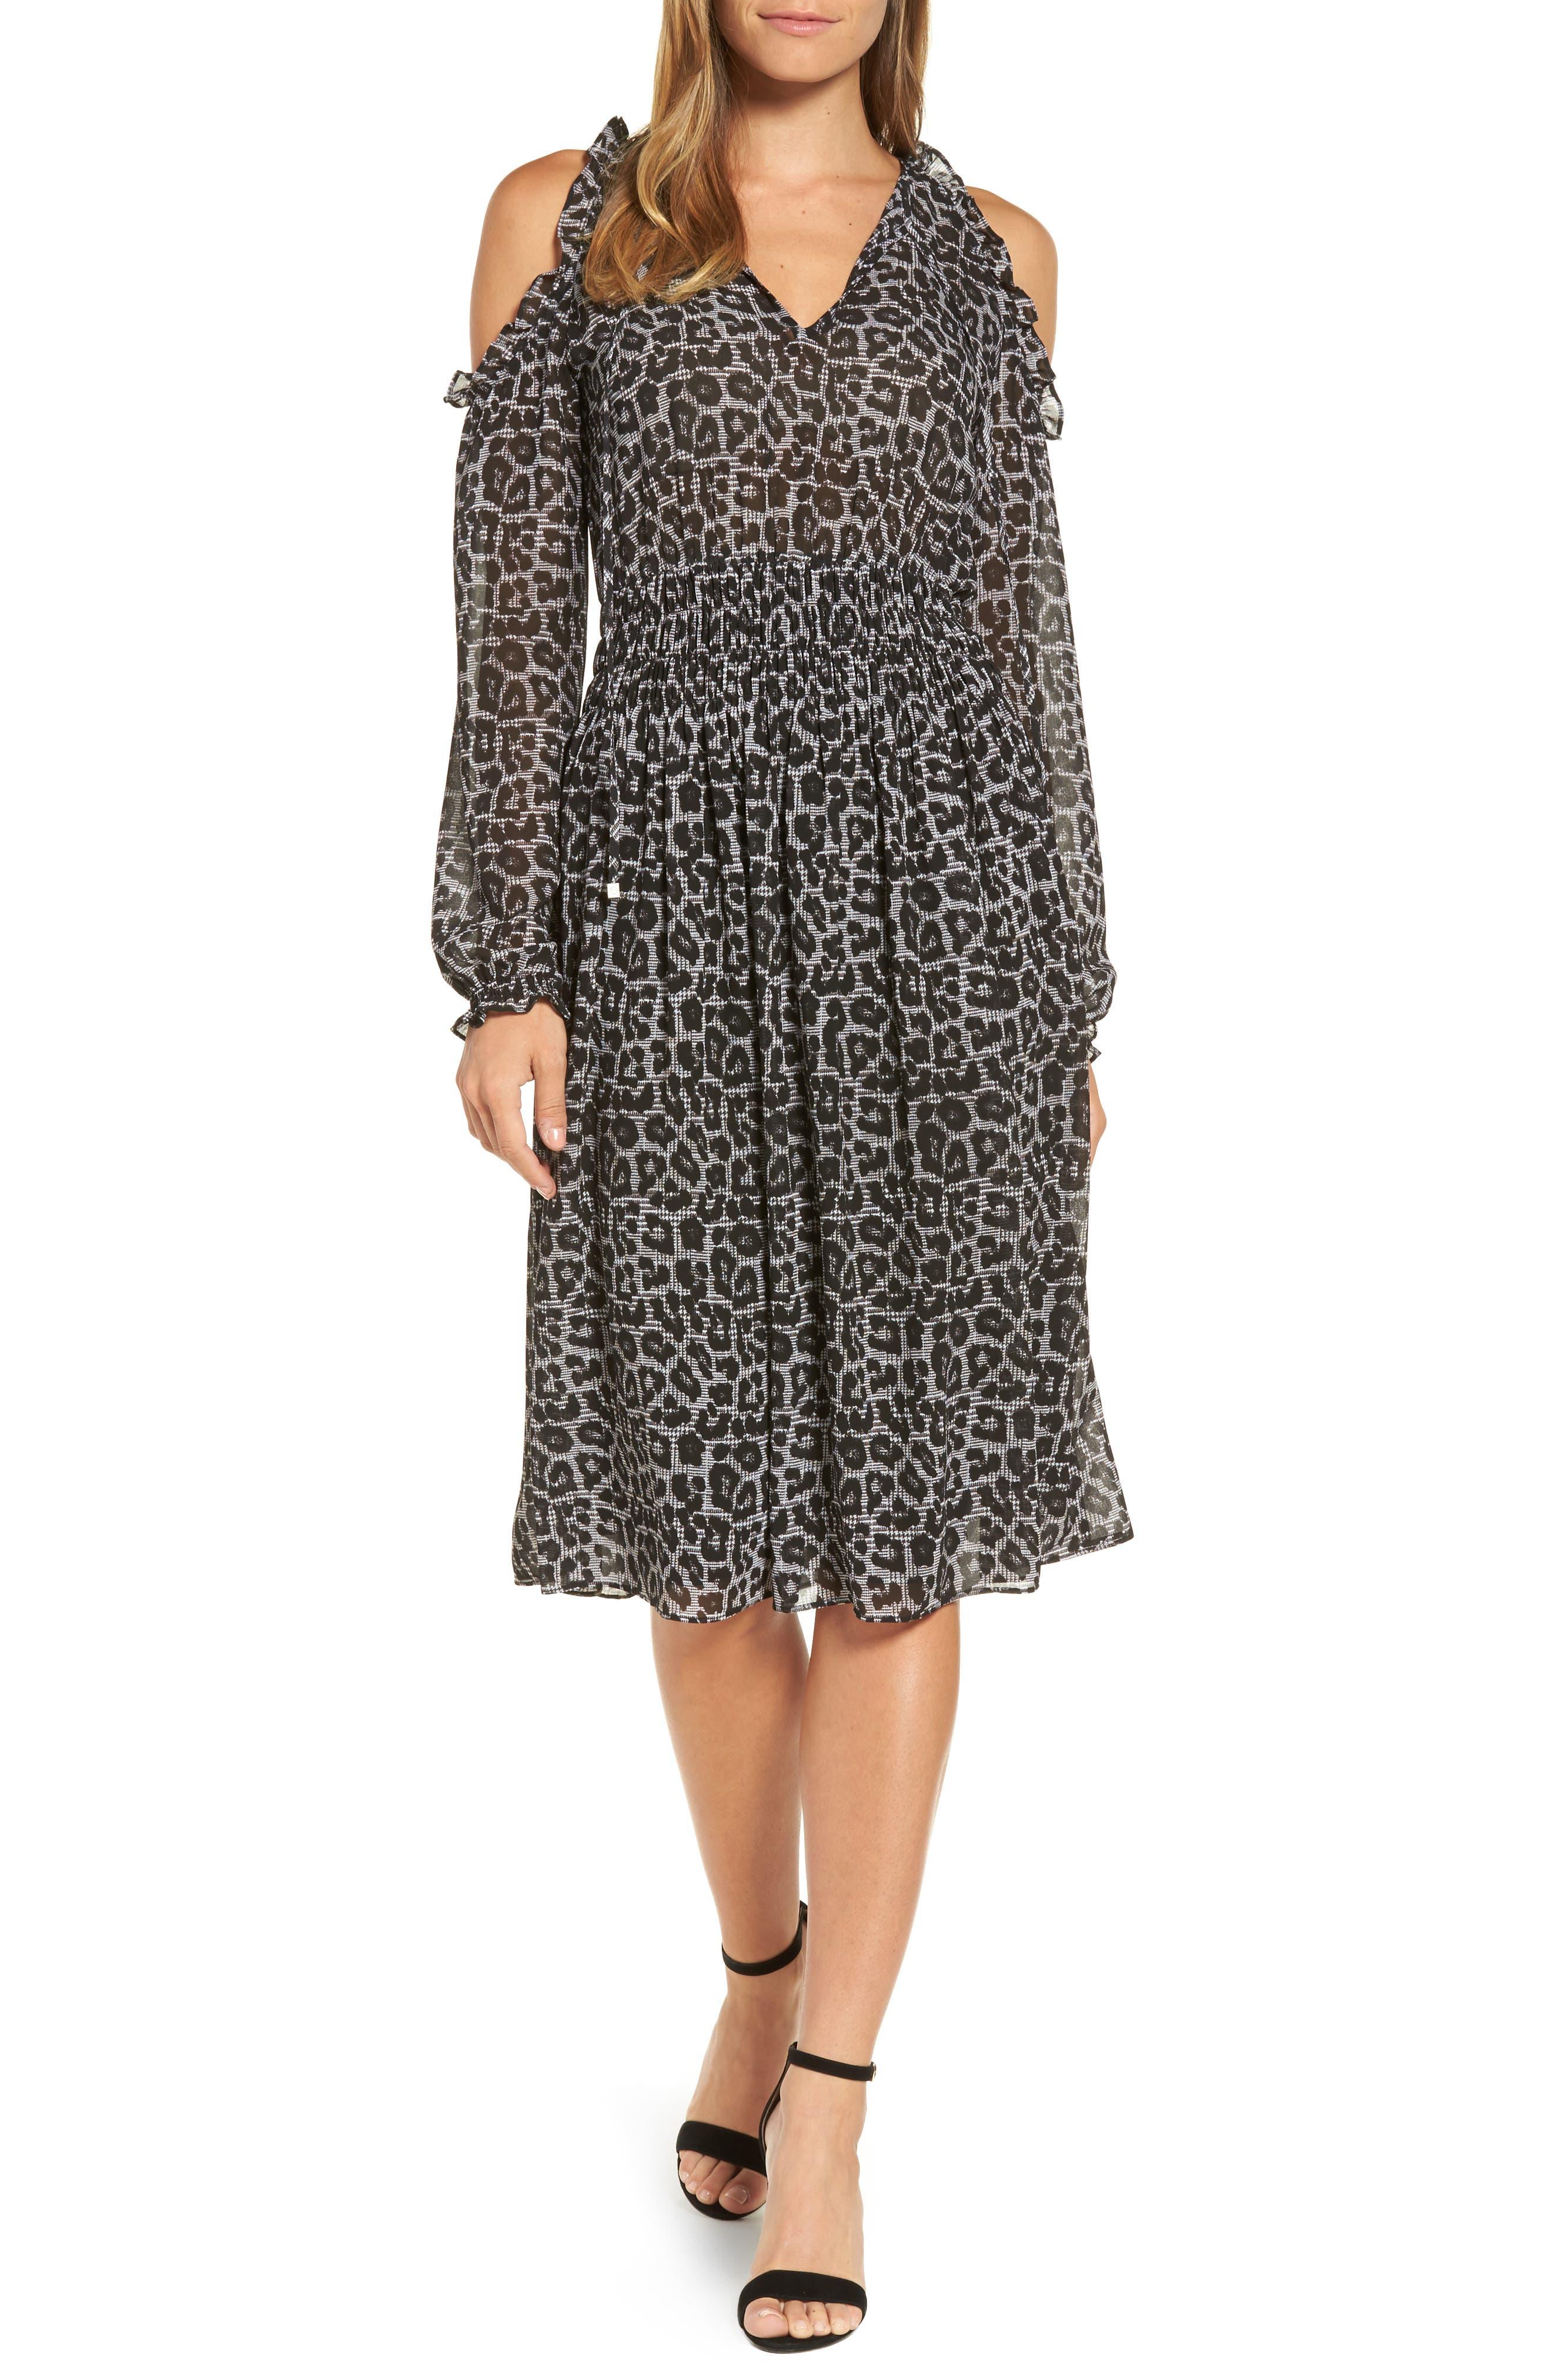 Alternate Image 1 Selected - MICHAEL Michael Kors Leopard Cold Shoulder Midi Dress